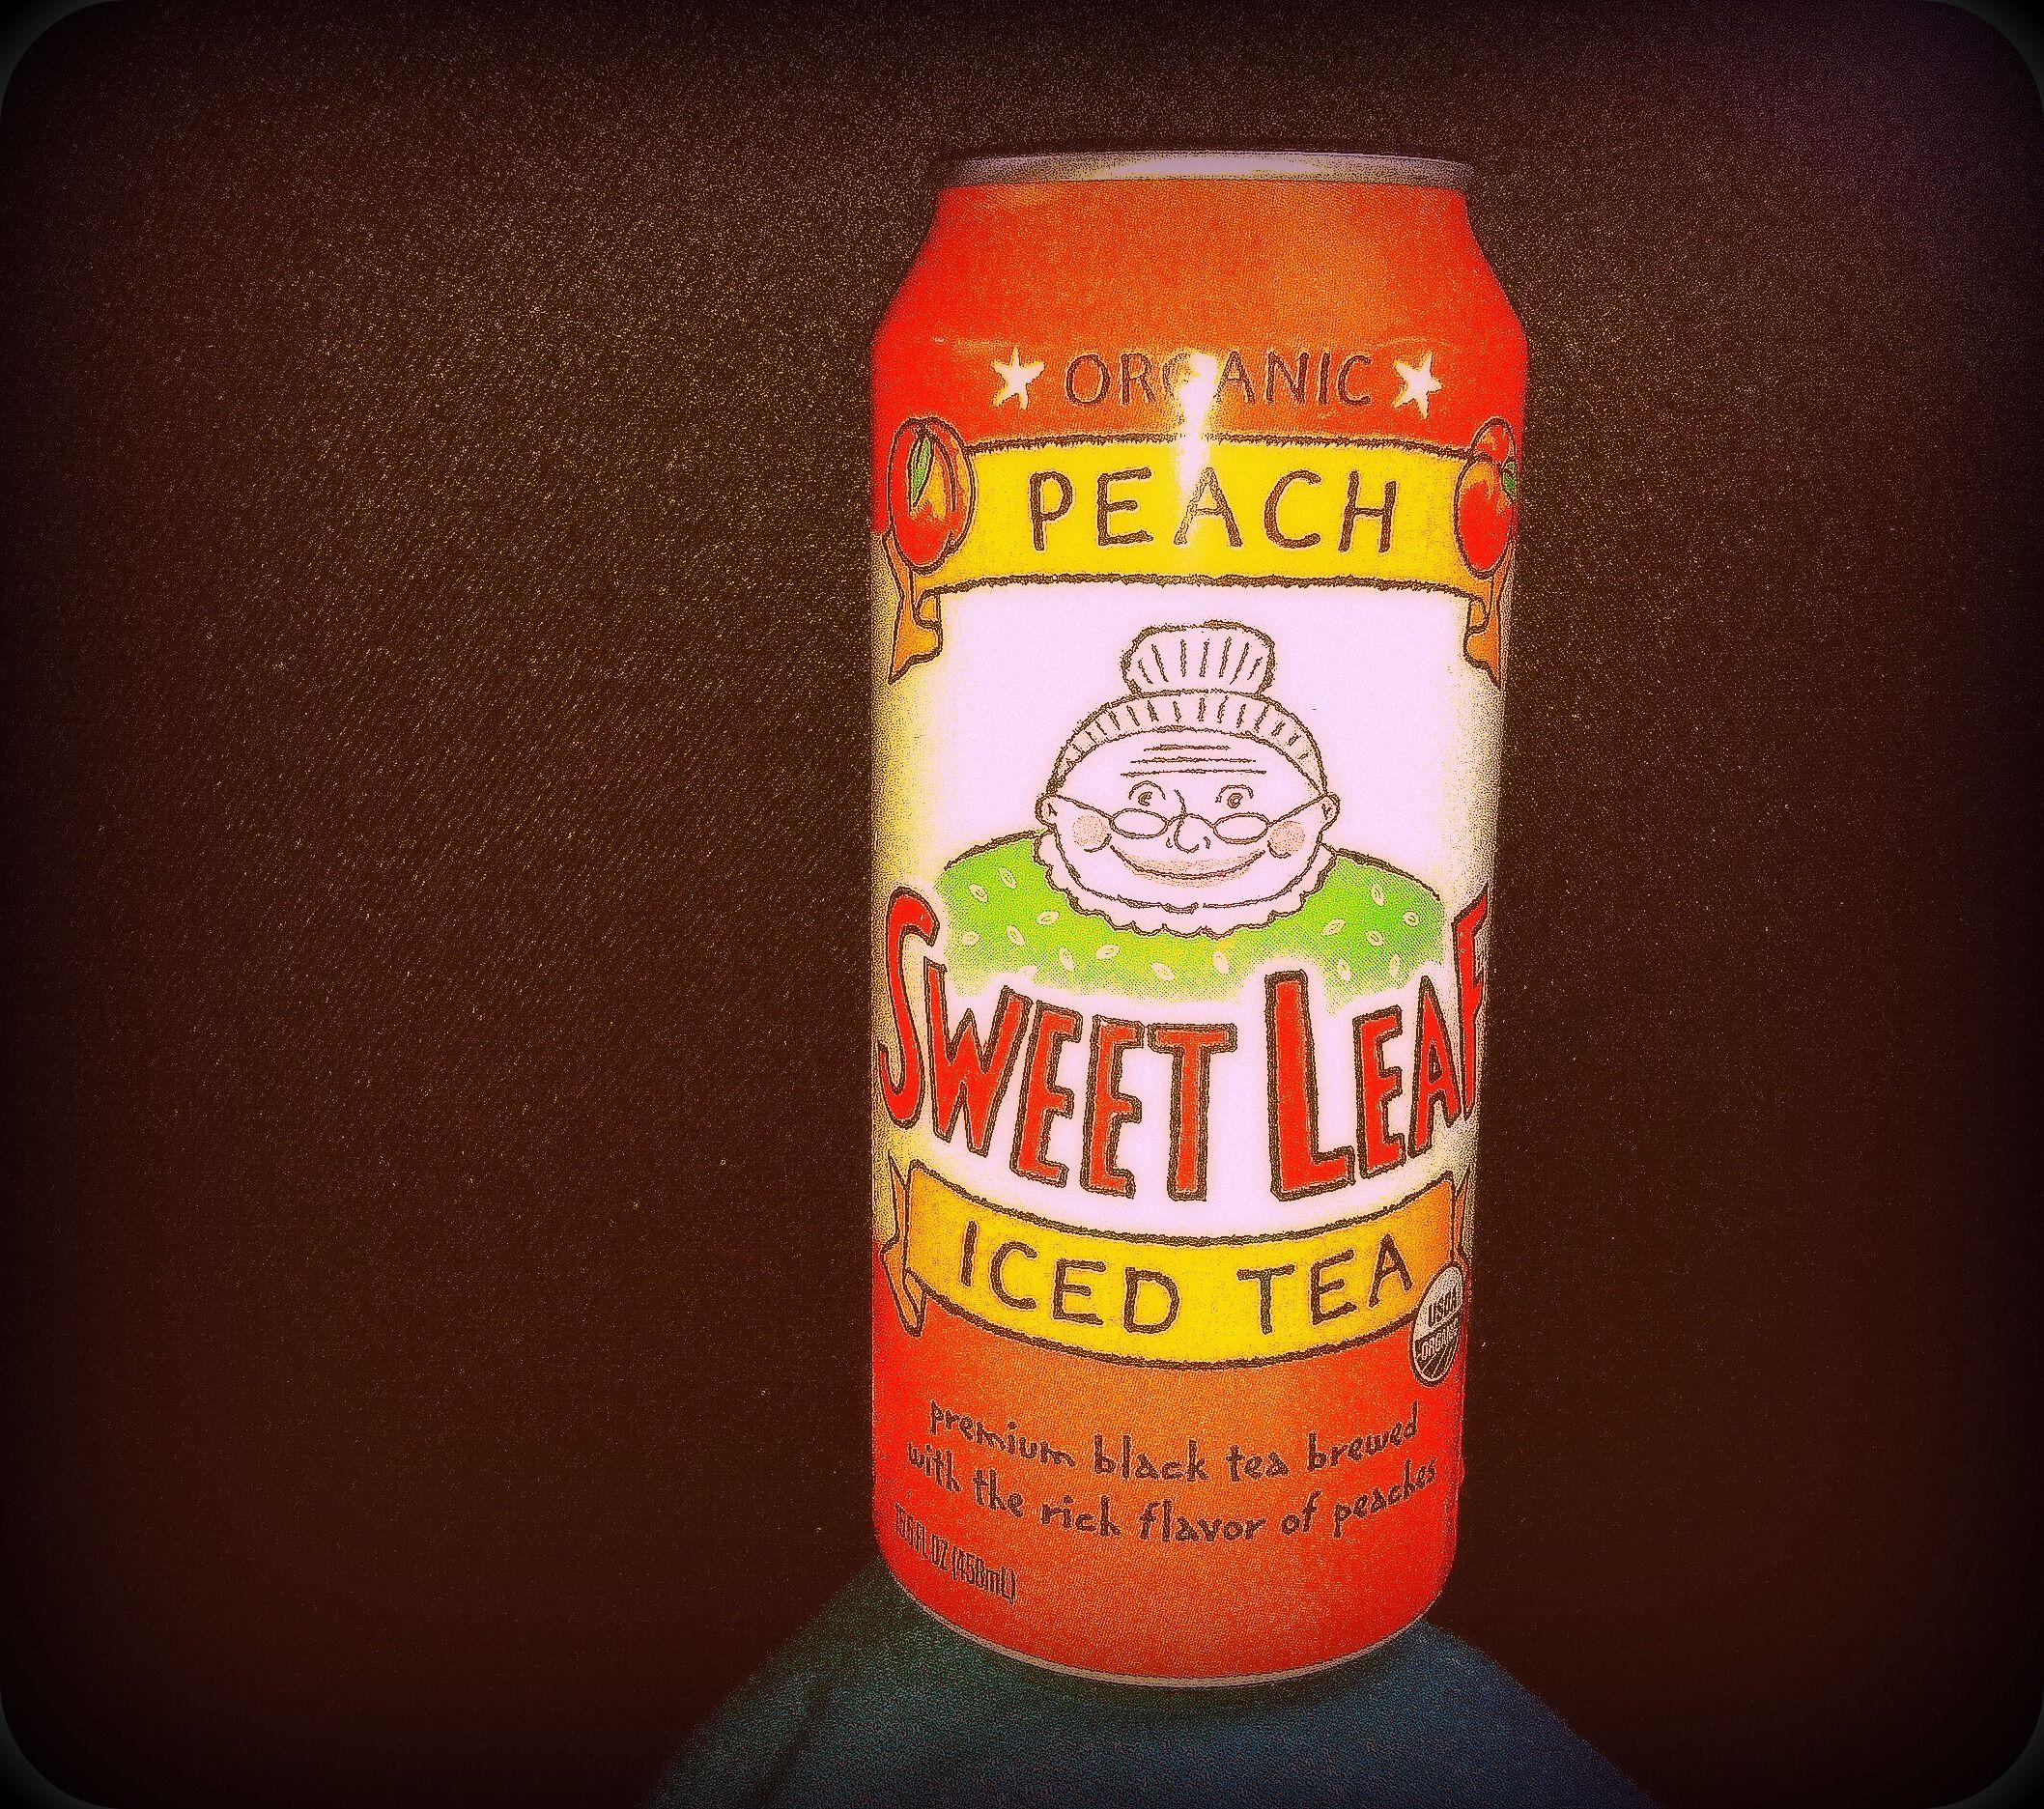 the best peach tea aroun' i guarantee